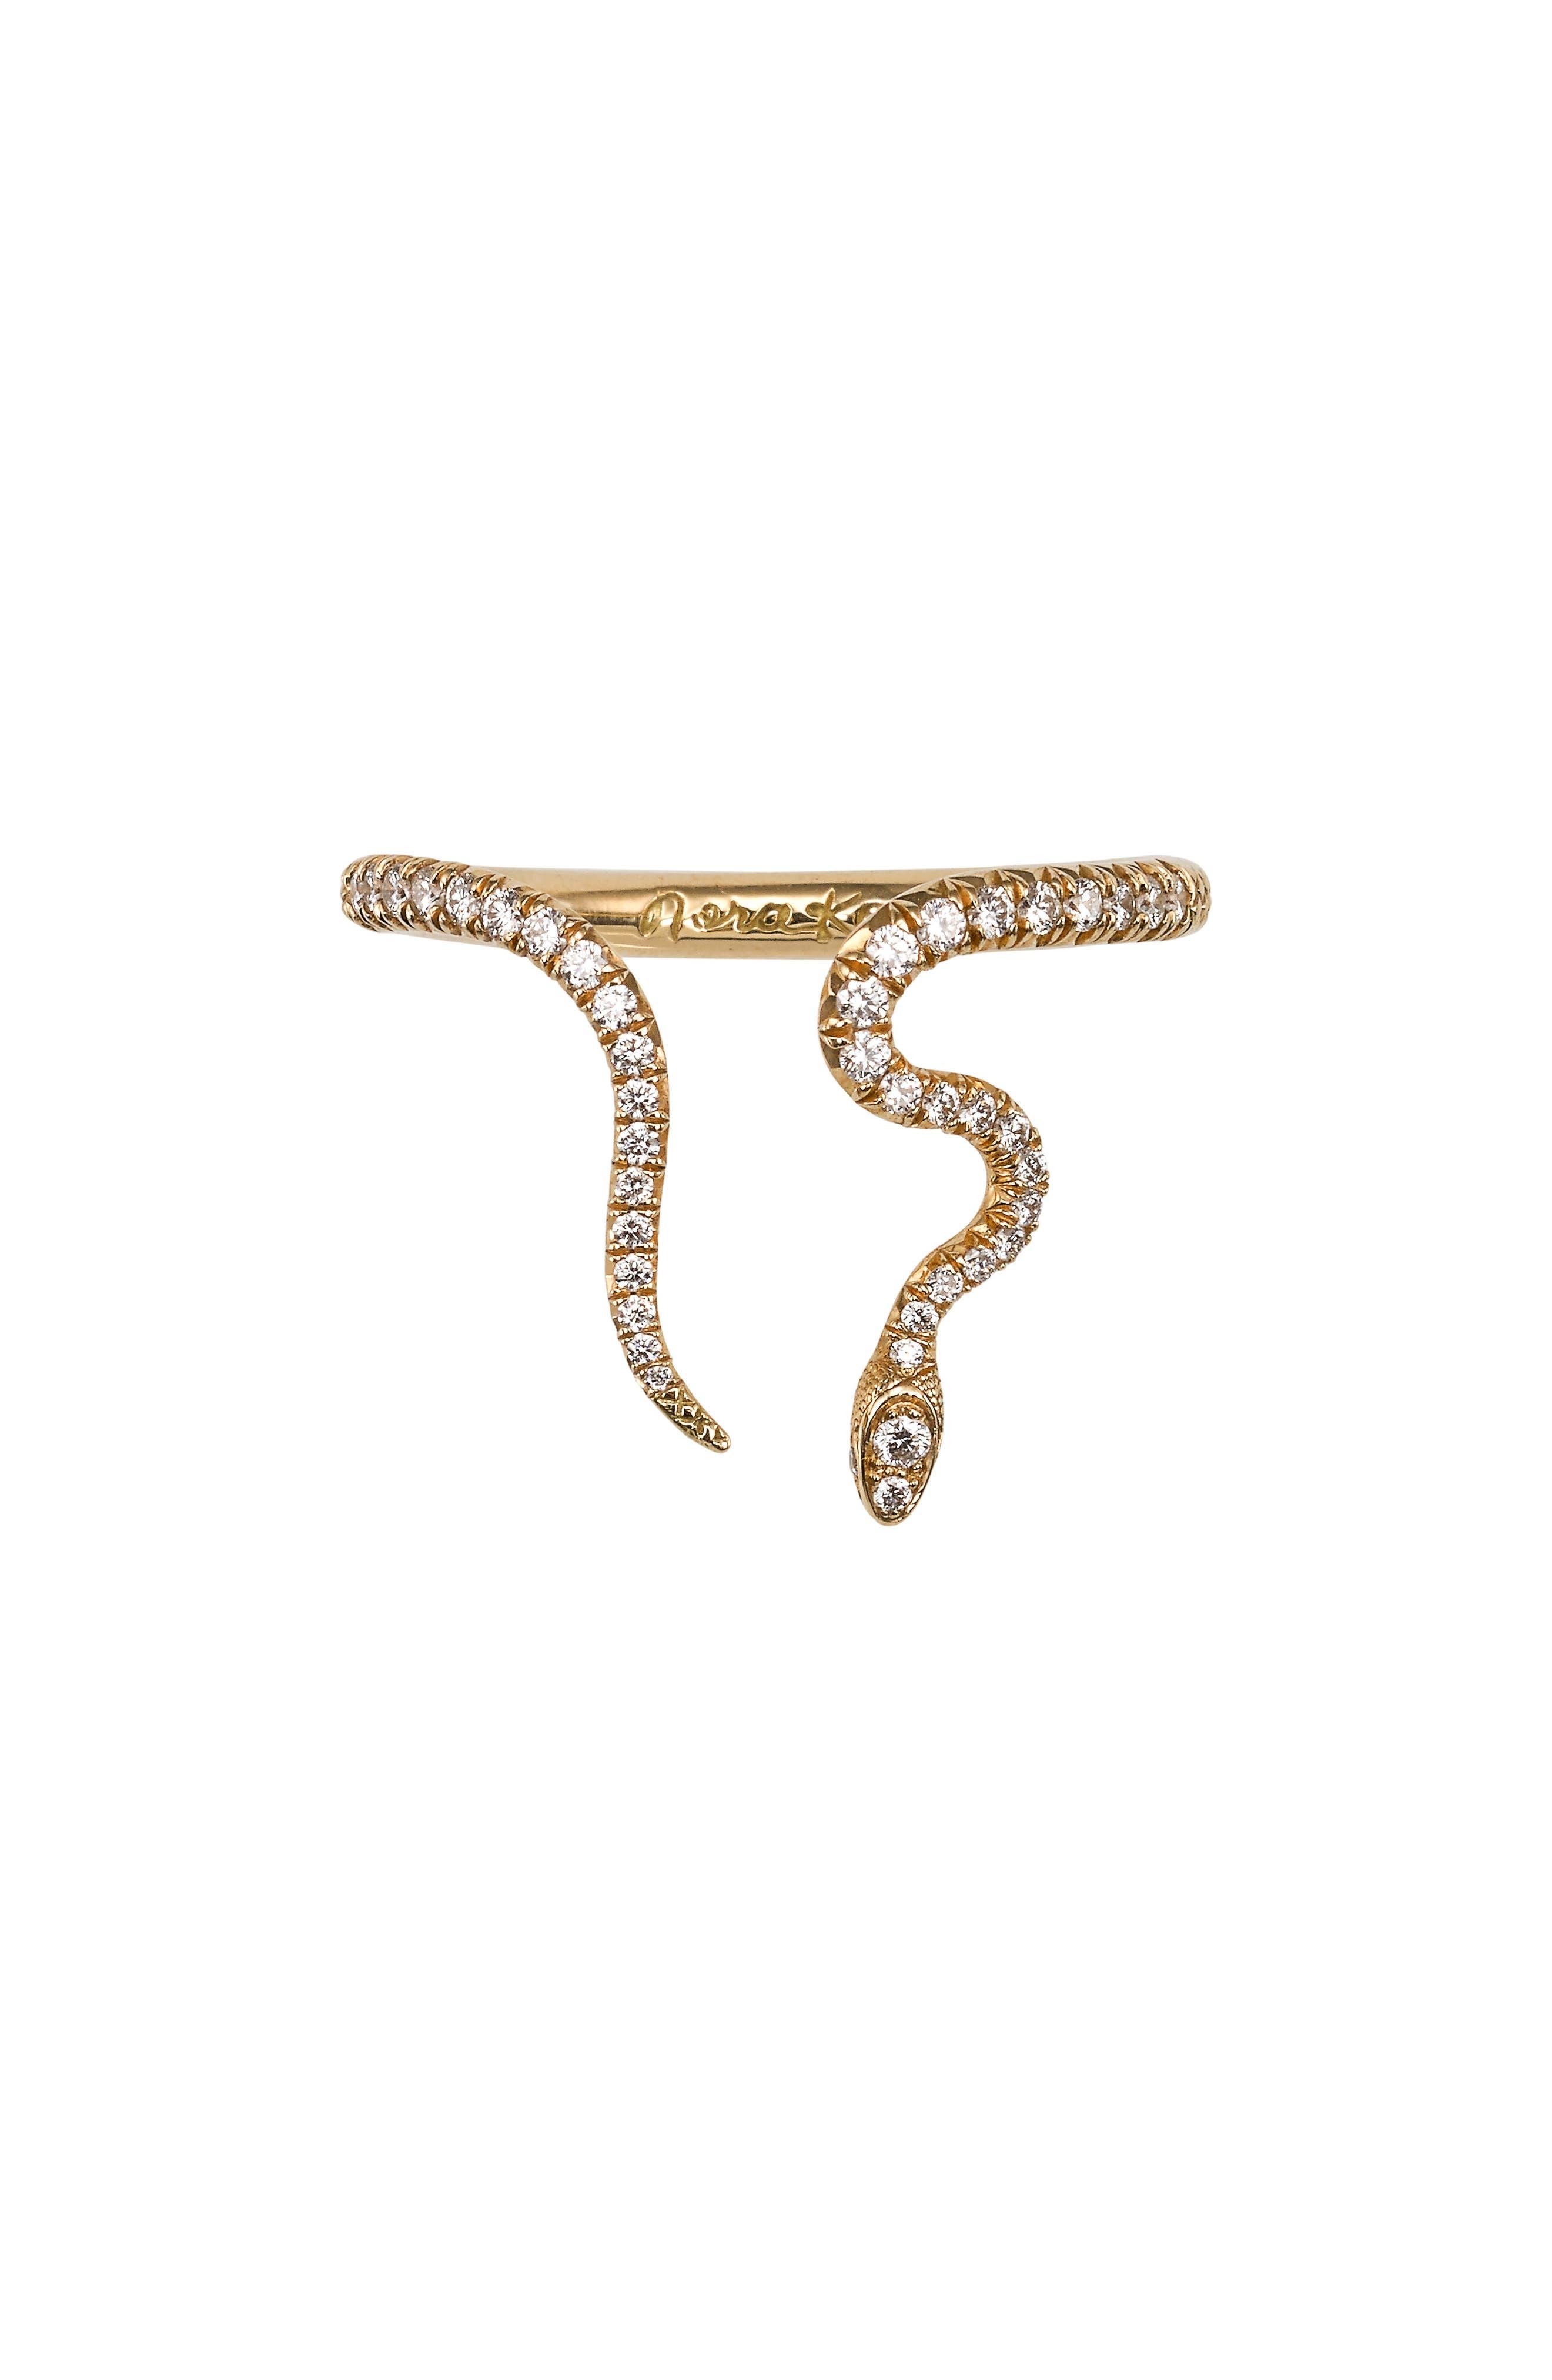 Alexandra Diamond Open Snake Ring,                         Main,                         color, YELLOW GOLD